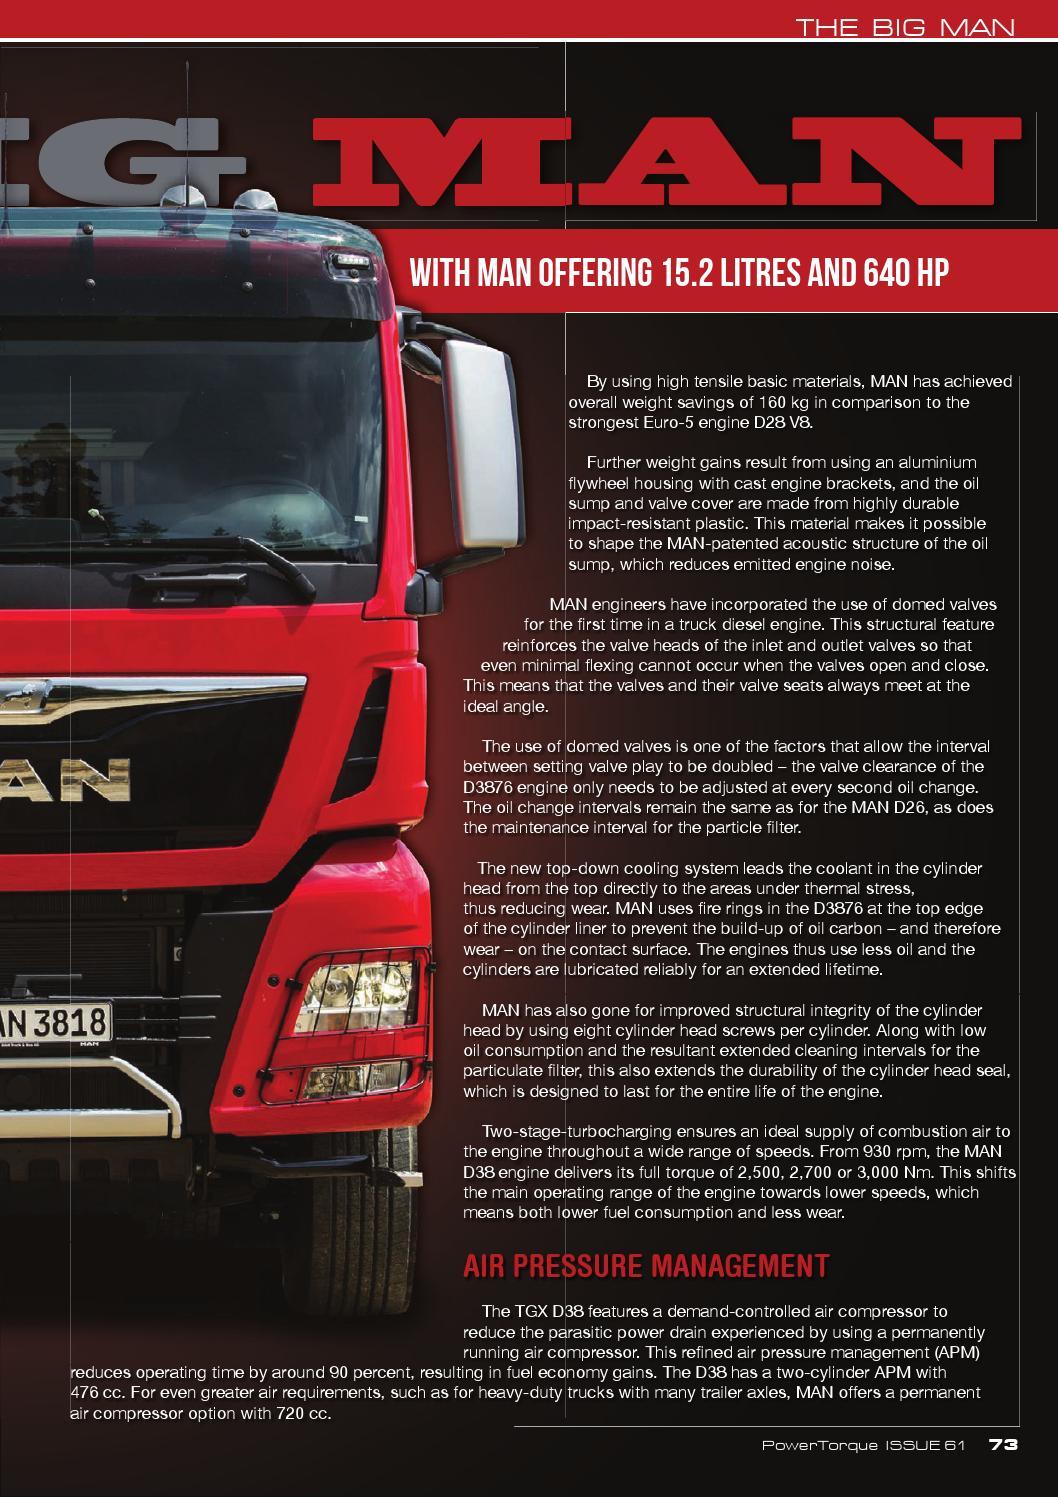 PowerTorque Magazine Issue 61 sample by Motoring Matters